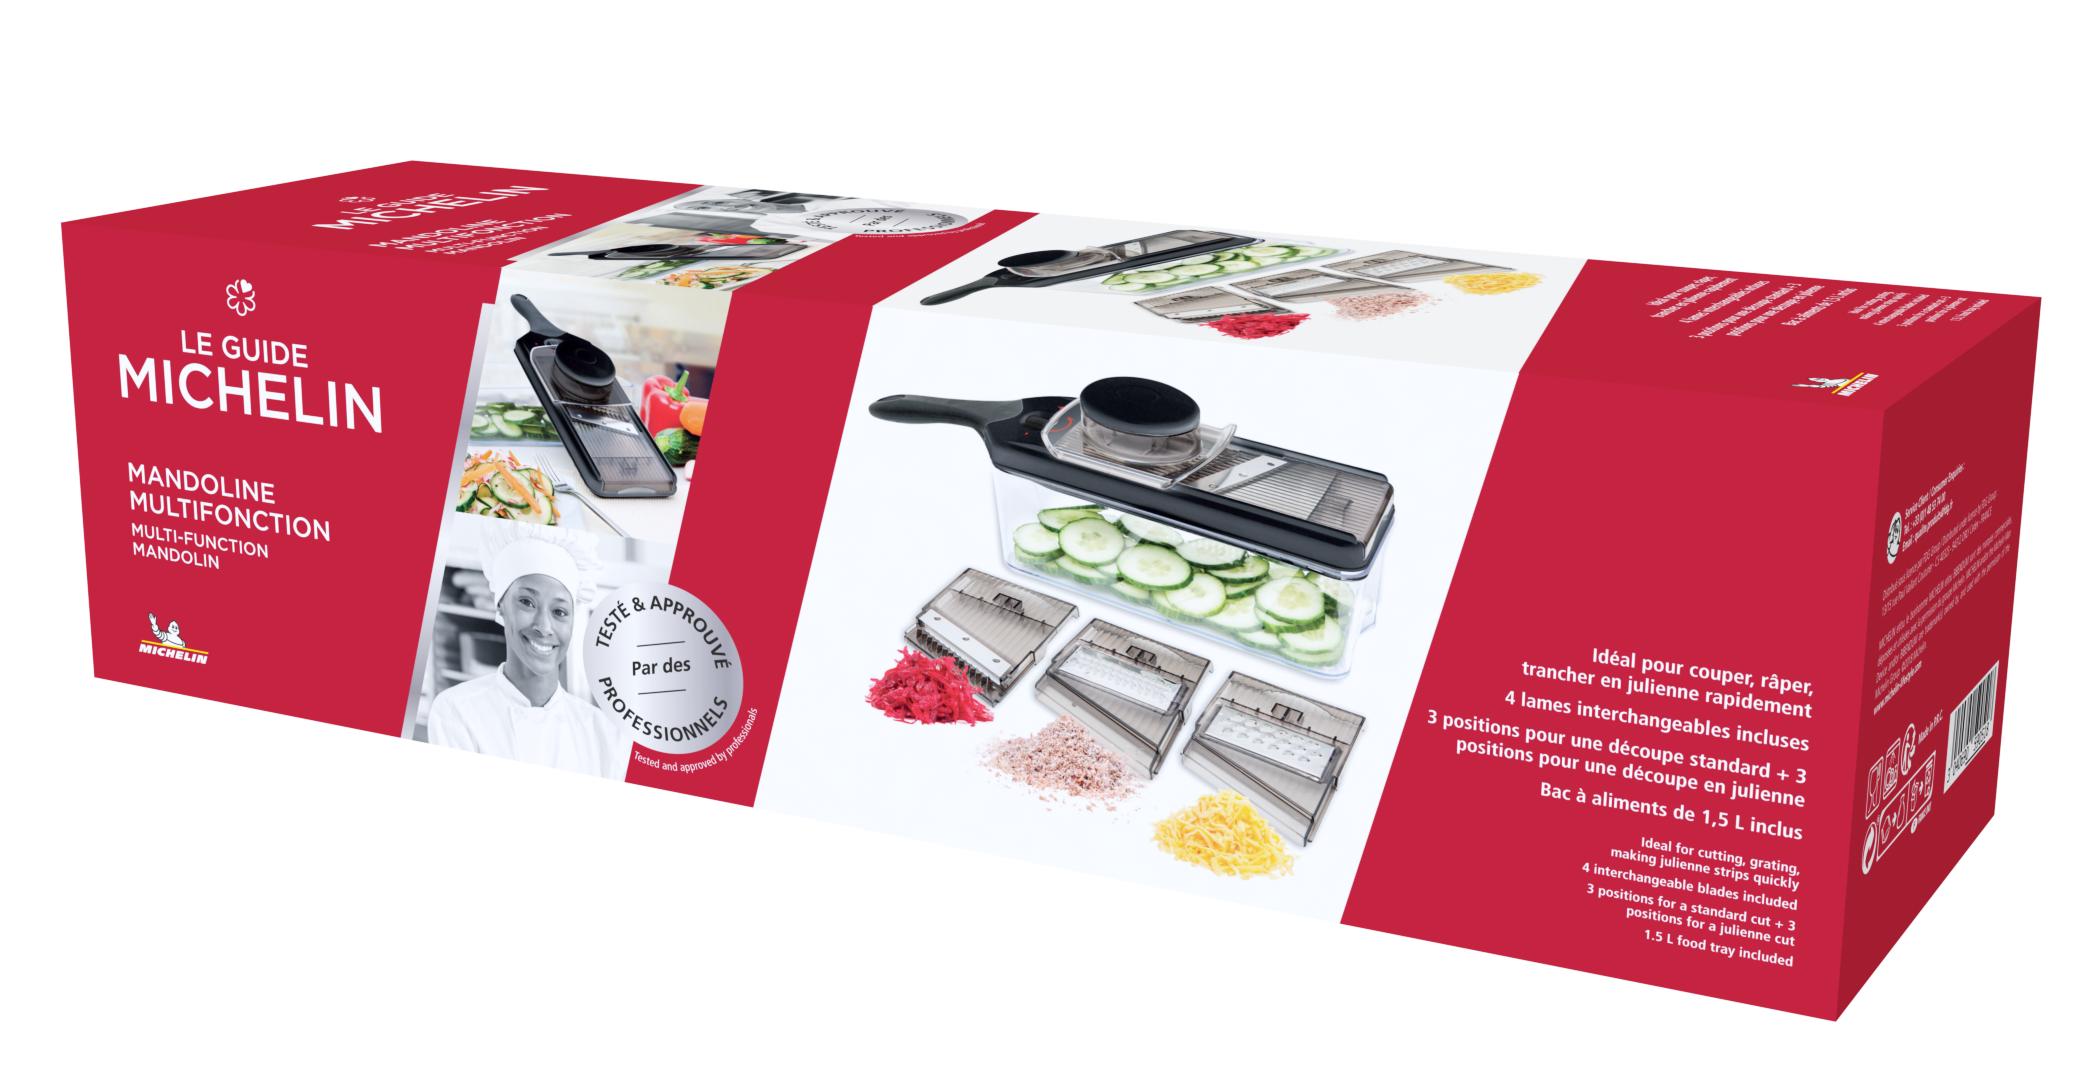 gnrjgs 1pi/èce Coque en silicone /à p/âtisserie badigeonner dhuile Brosse Barbecue ustensile pour griller cuisson marinade Noir